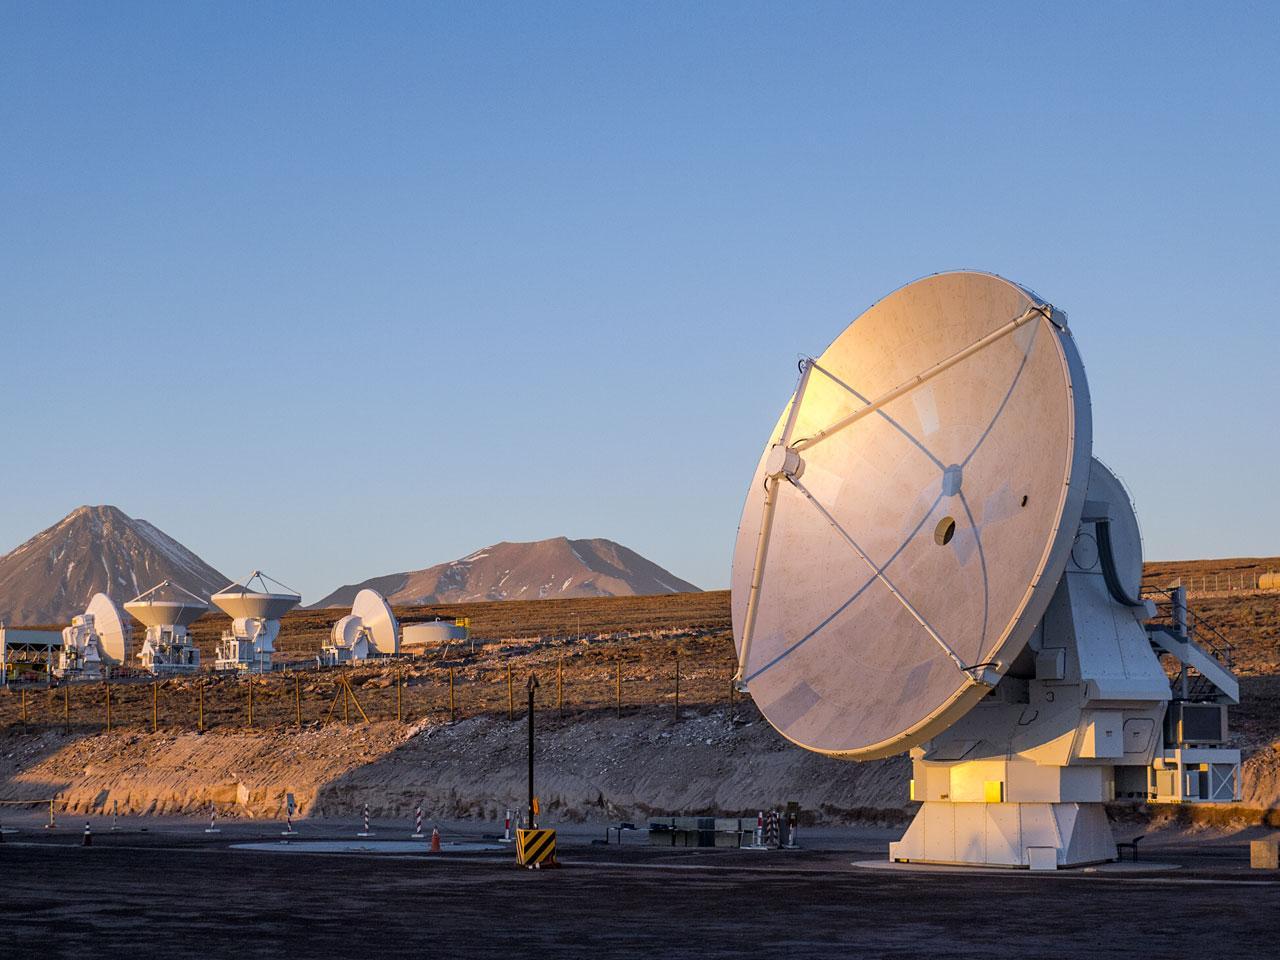 The array consists of 66 antennas spread across a 16 kilometer area (Image: ESO)